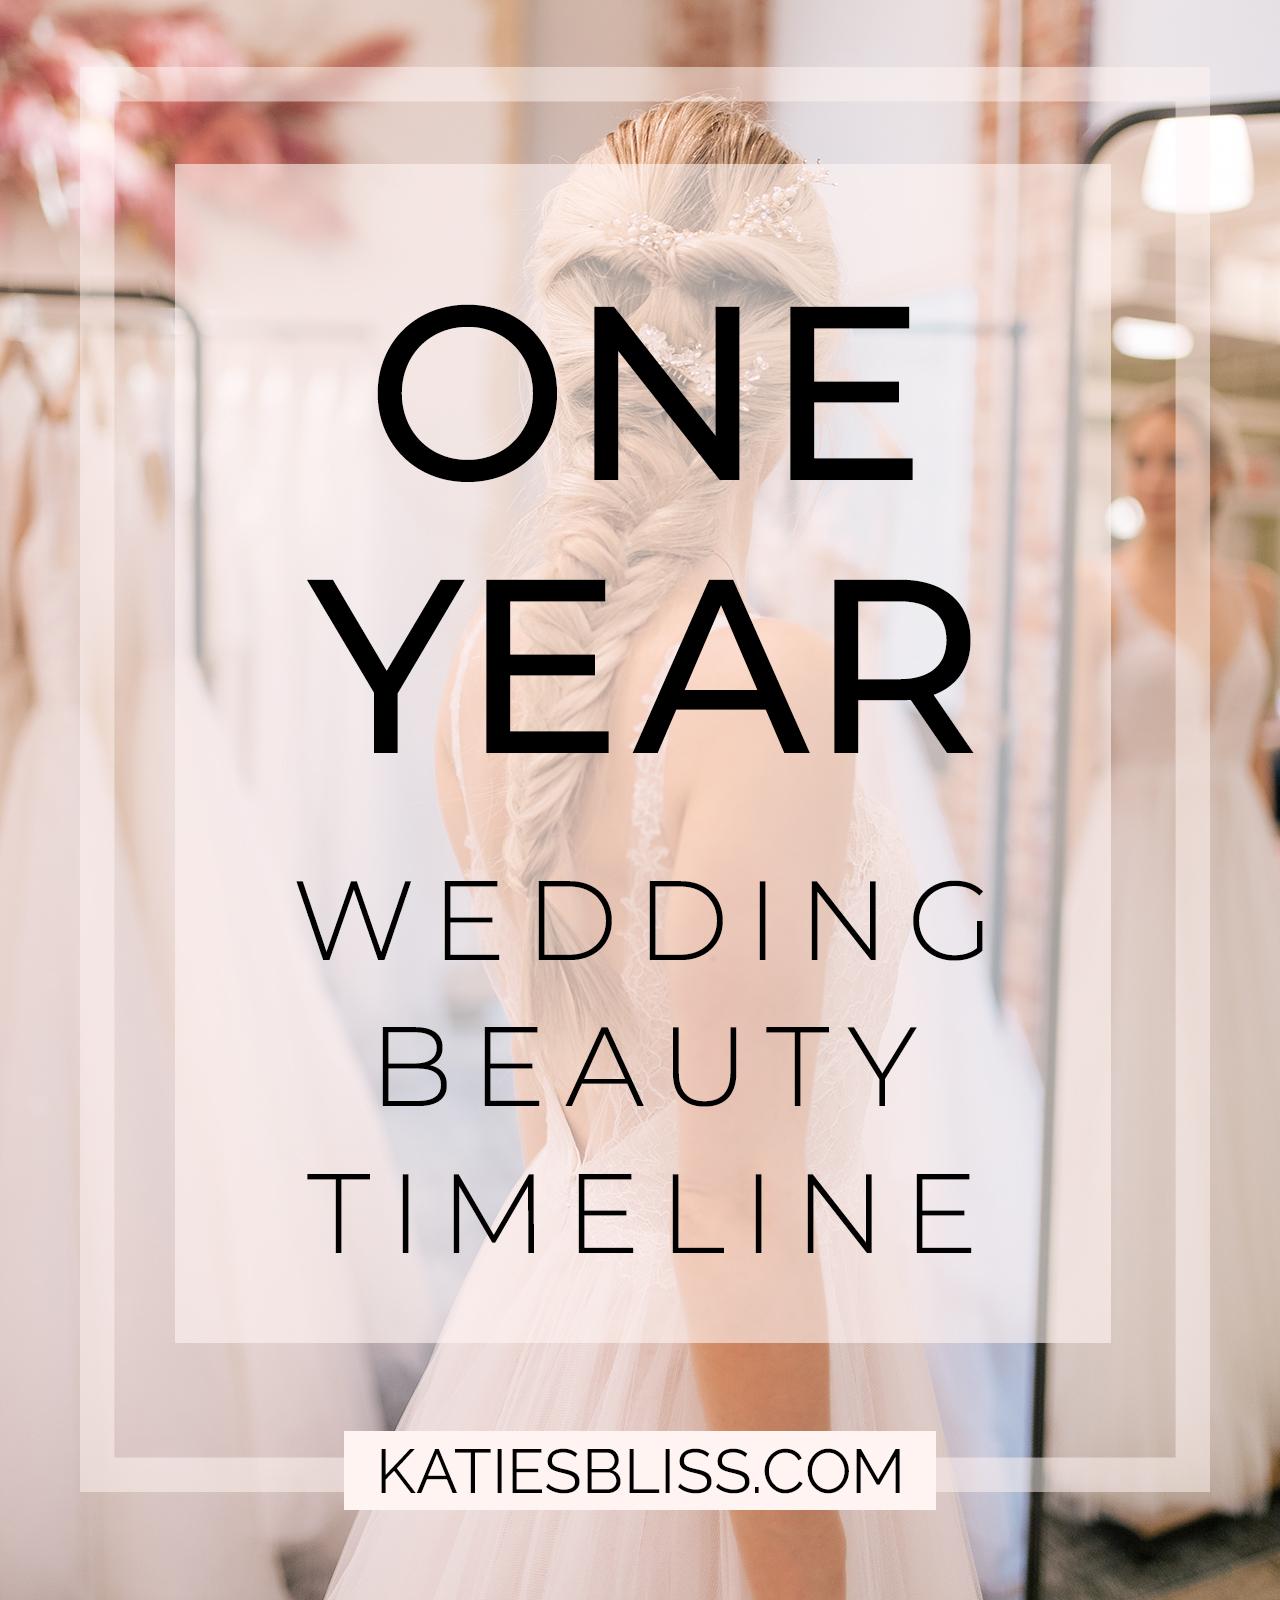 Katies Bliss Wedding Beauty Timeline